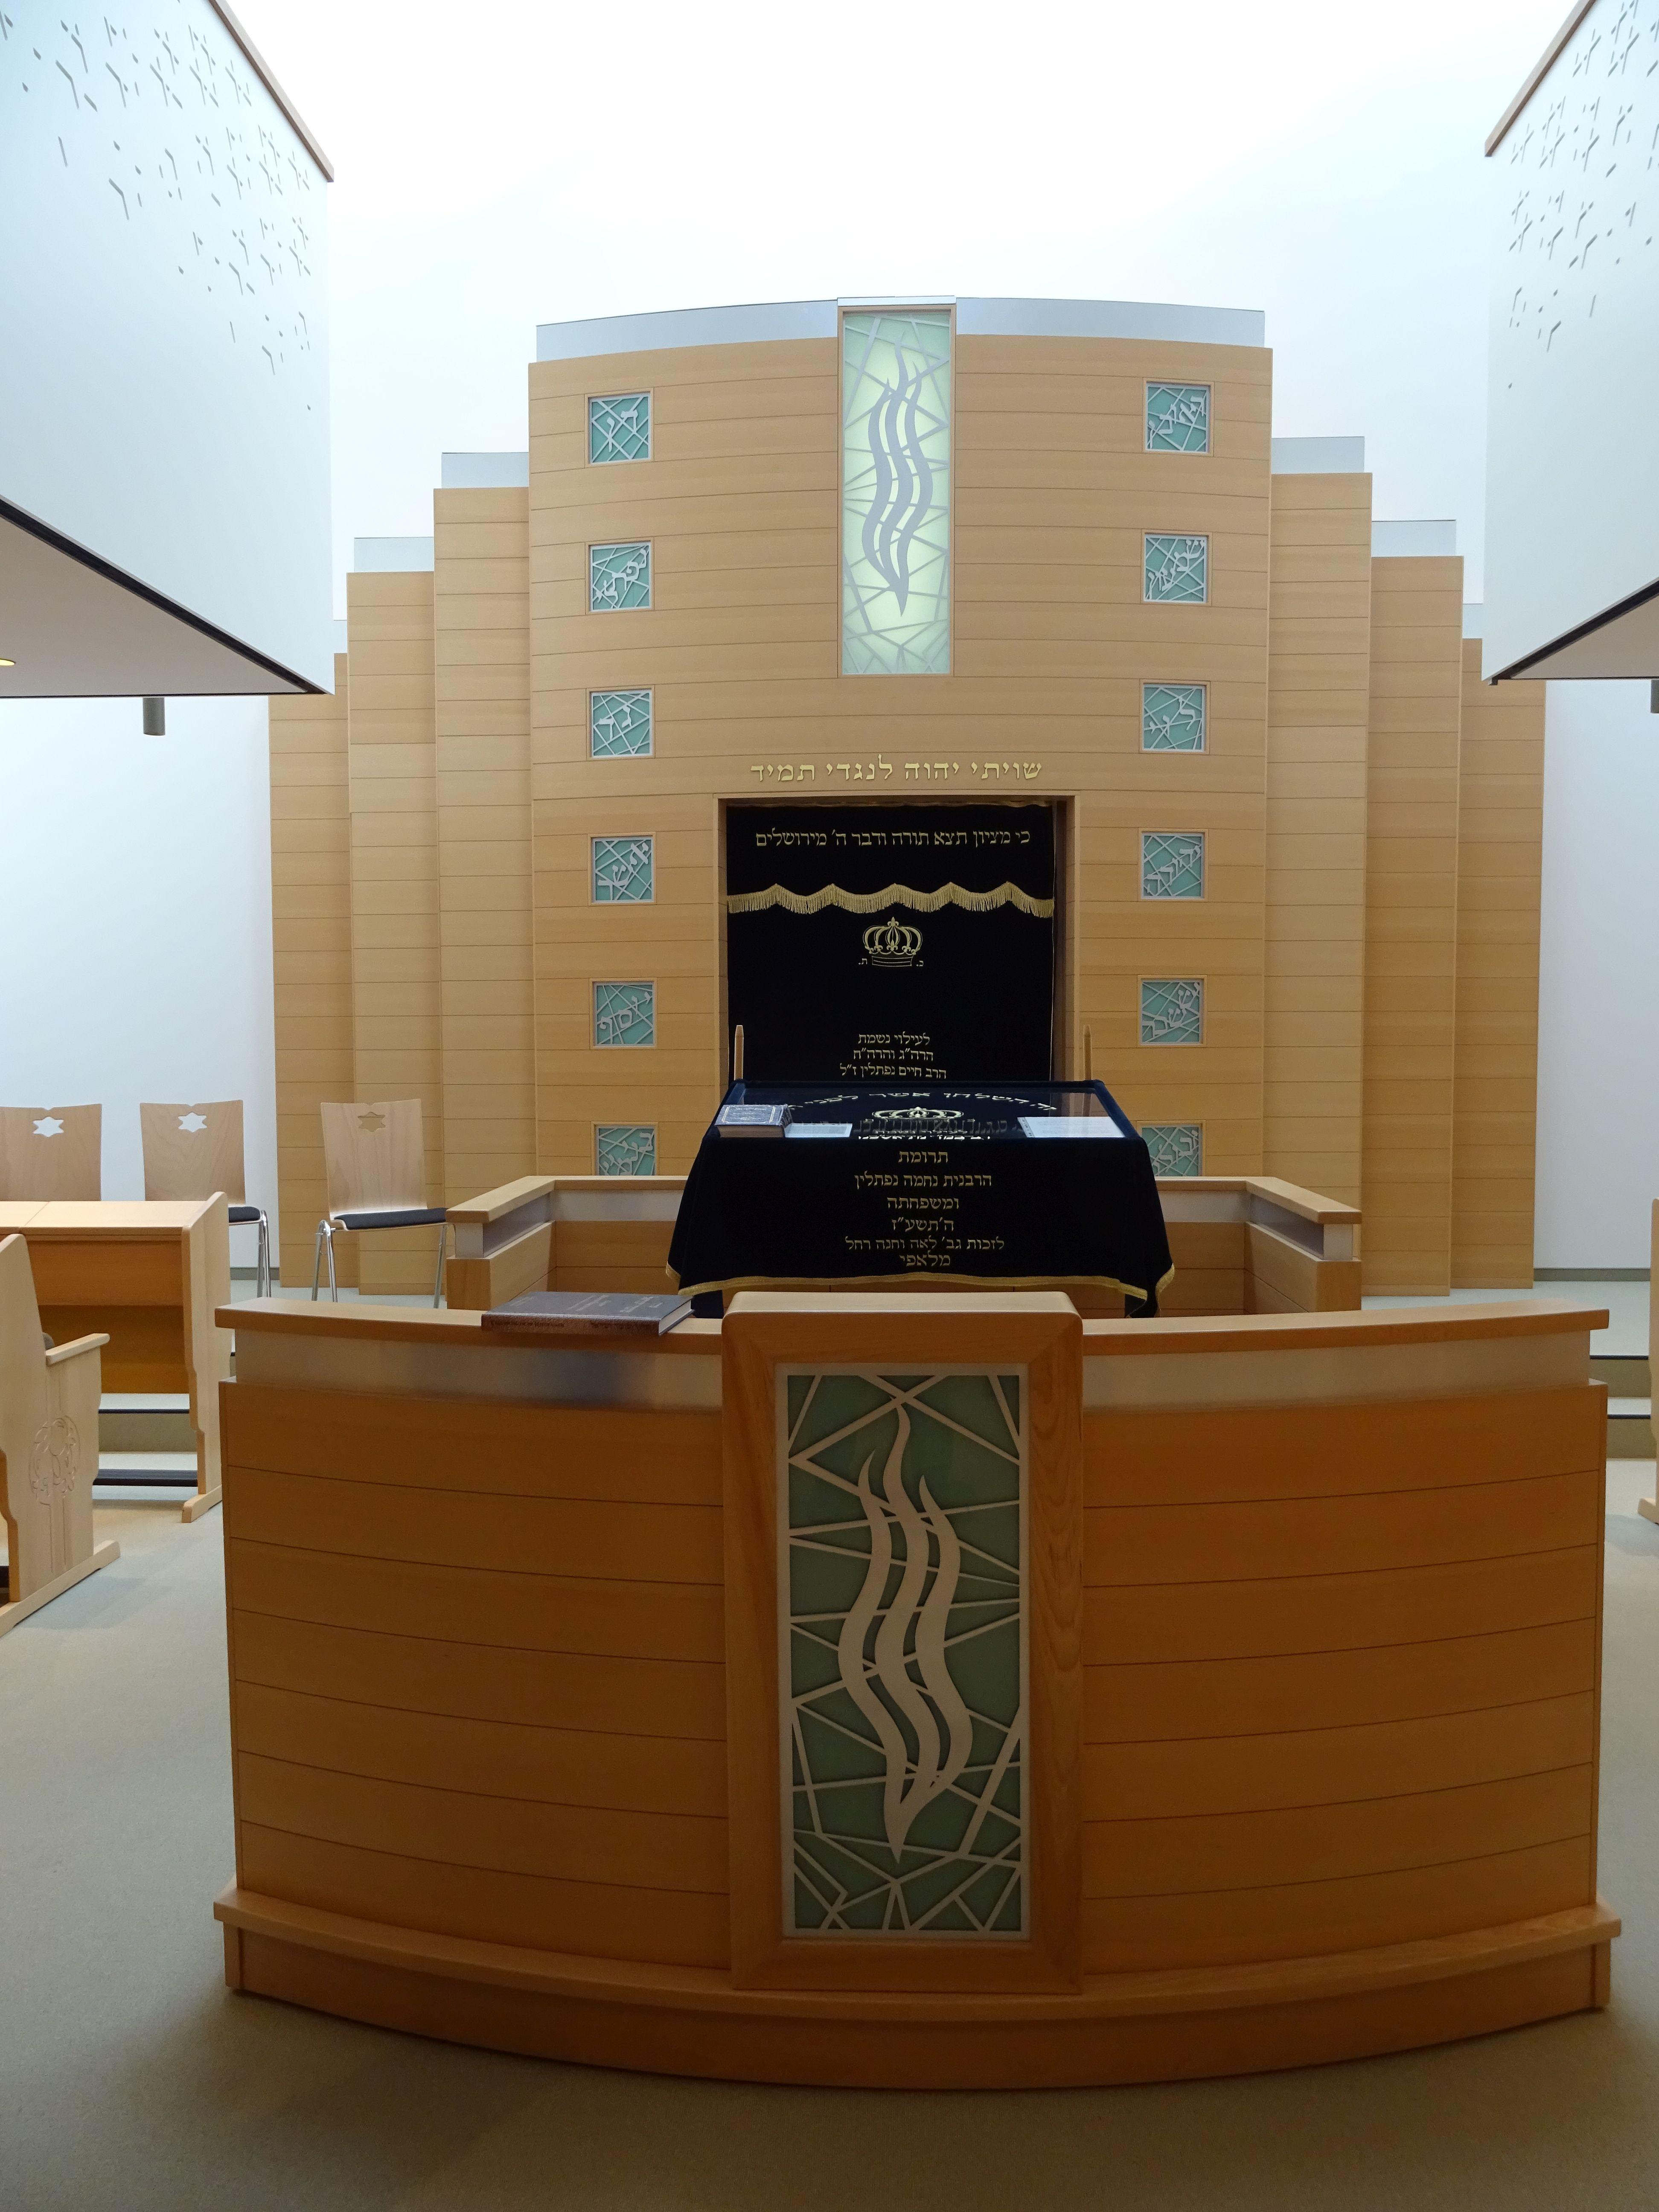 http://www.alemannia-judaica.de/images/Images%20432/Rottweil%20IRG60%202019033.jpg